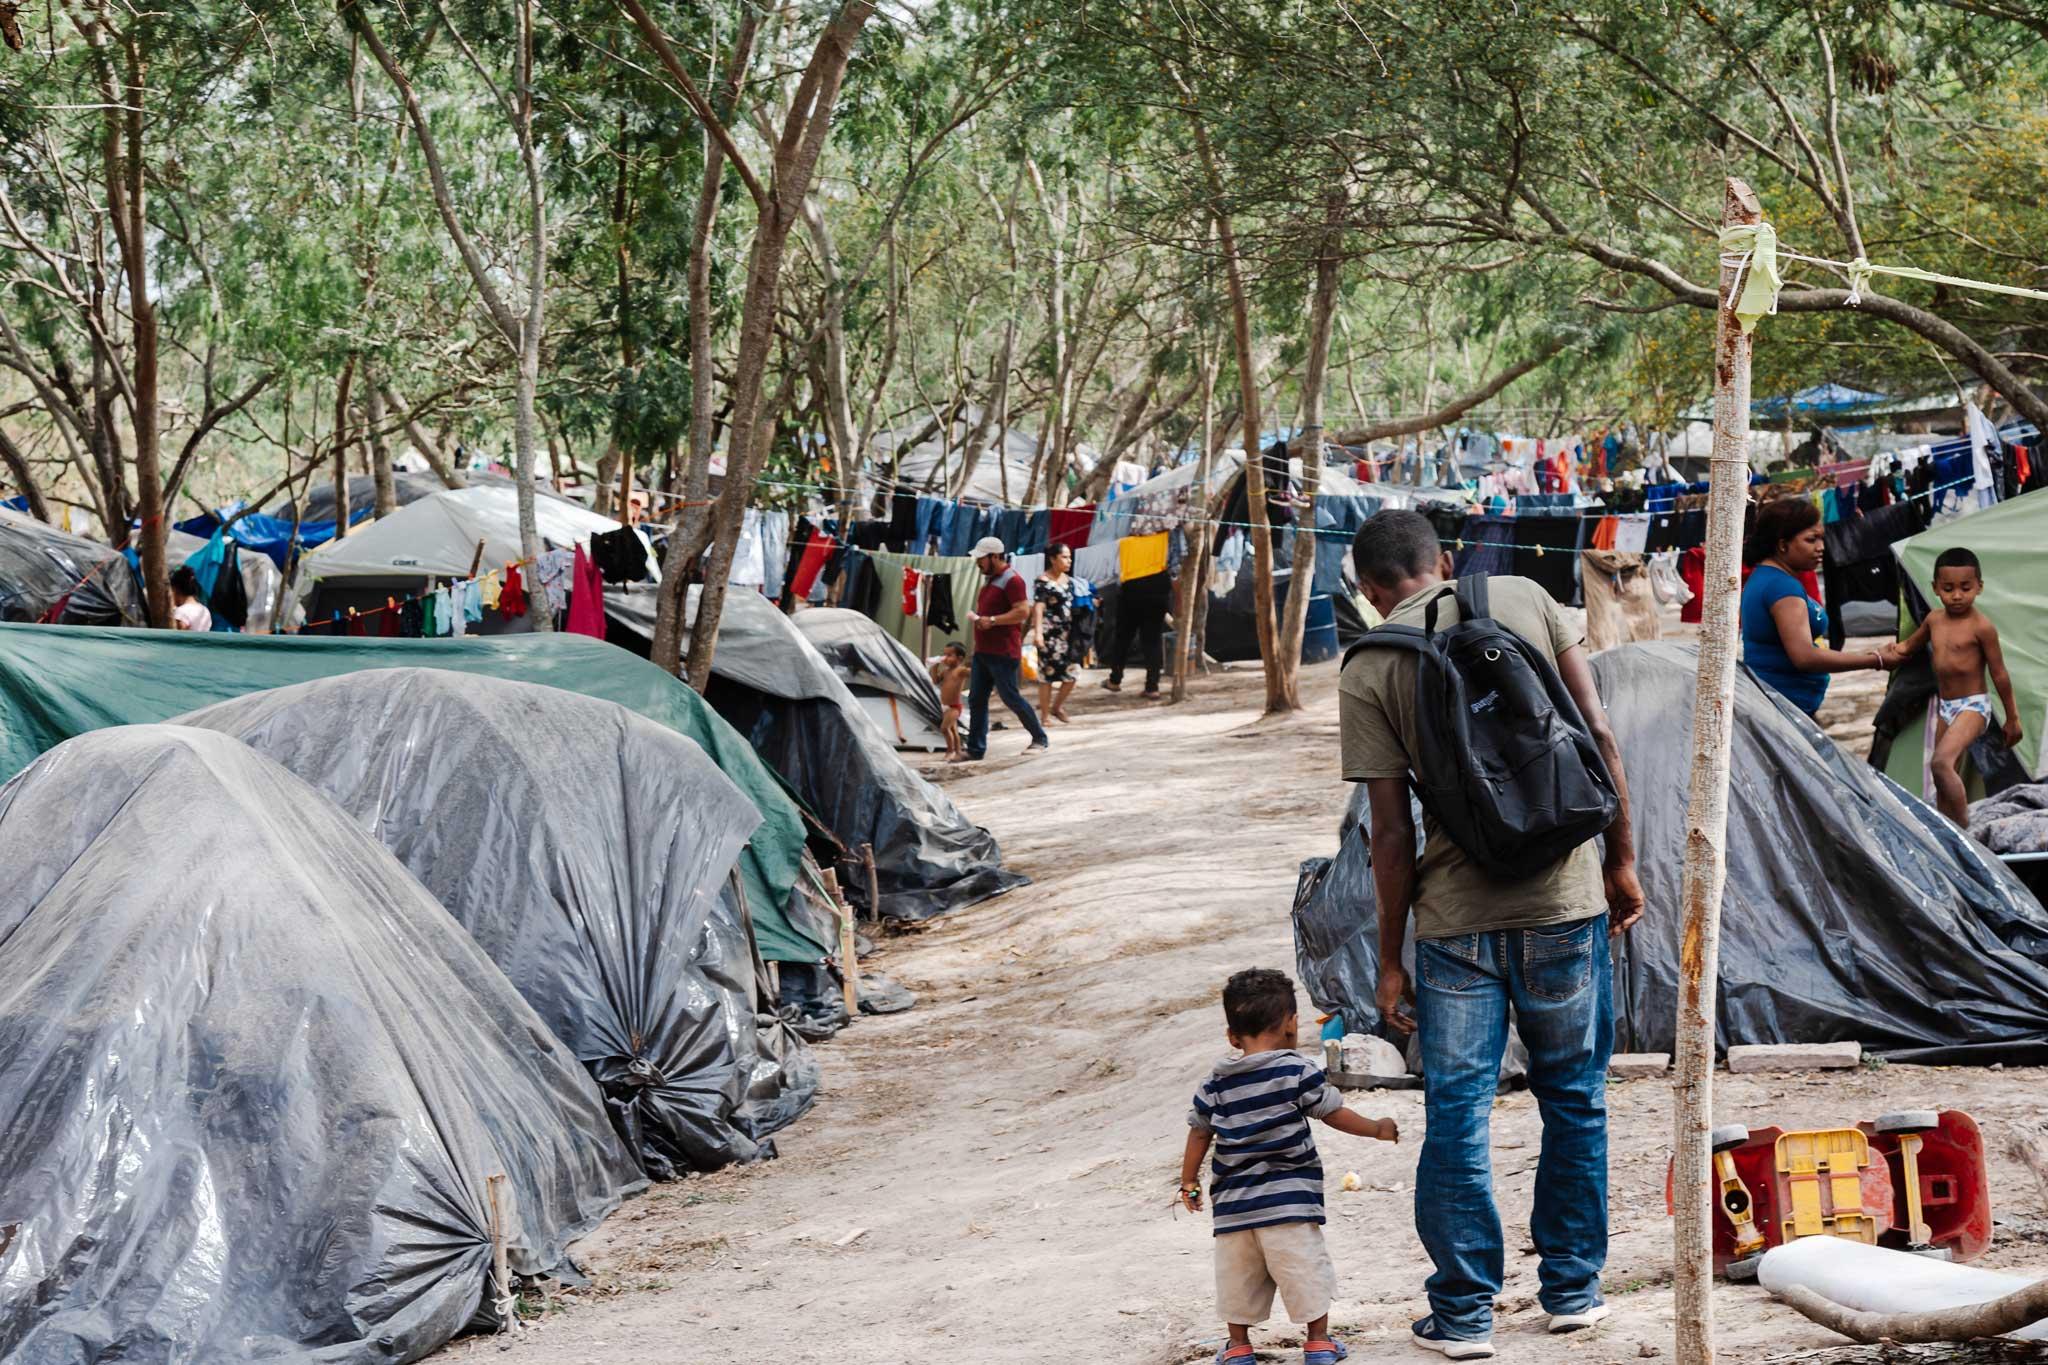 migrant-camp-us-mexico-border-tent-city-matamoros